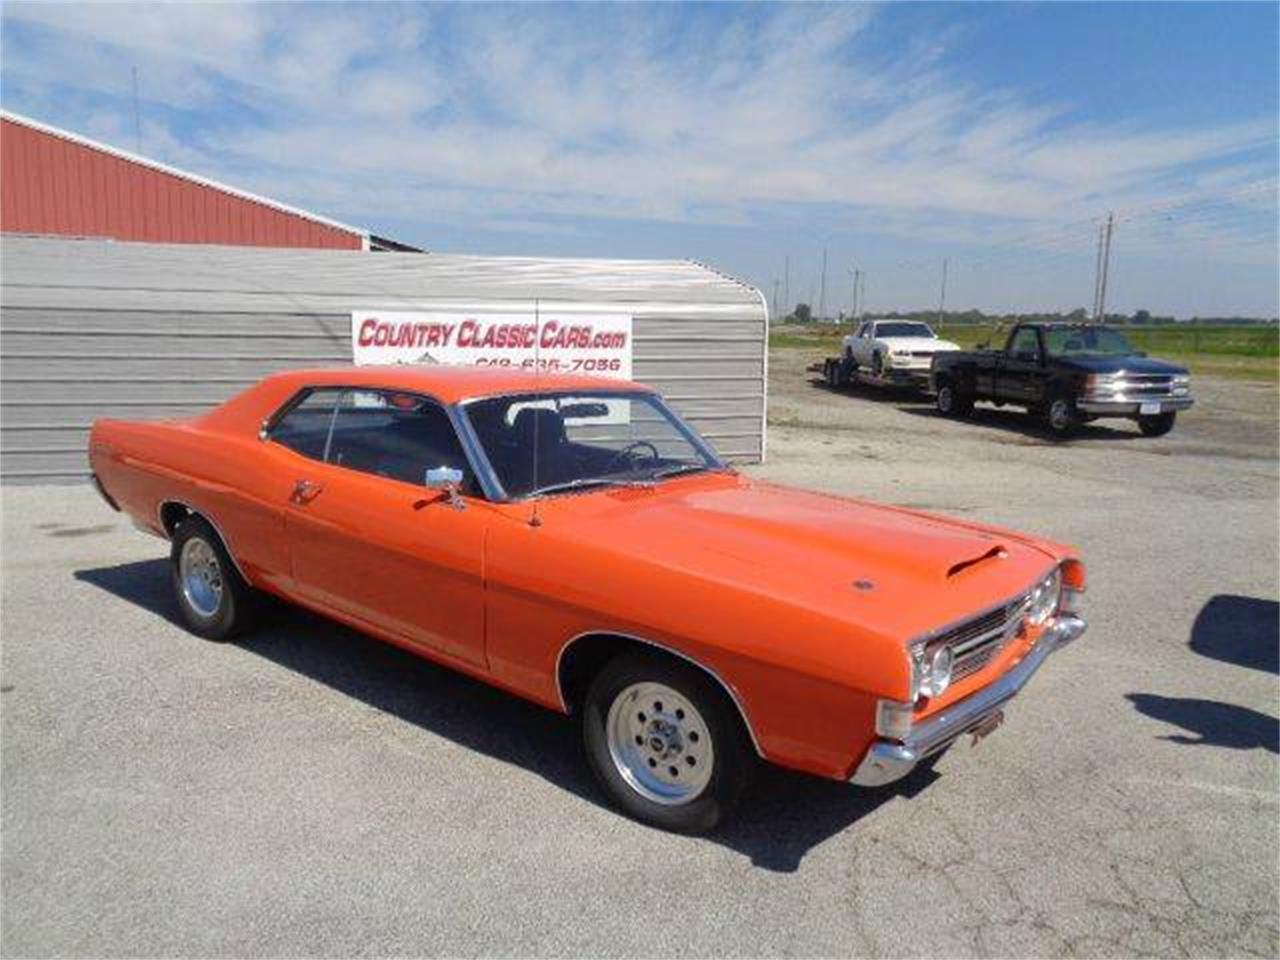 Large Picture of 1968 Fairlane located in Staunton Illinois - $15,950.00 - LUPX